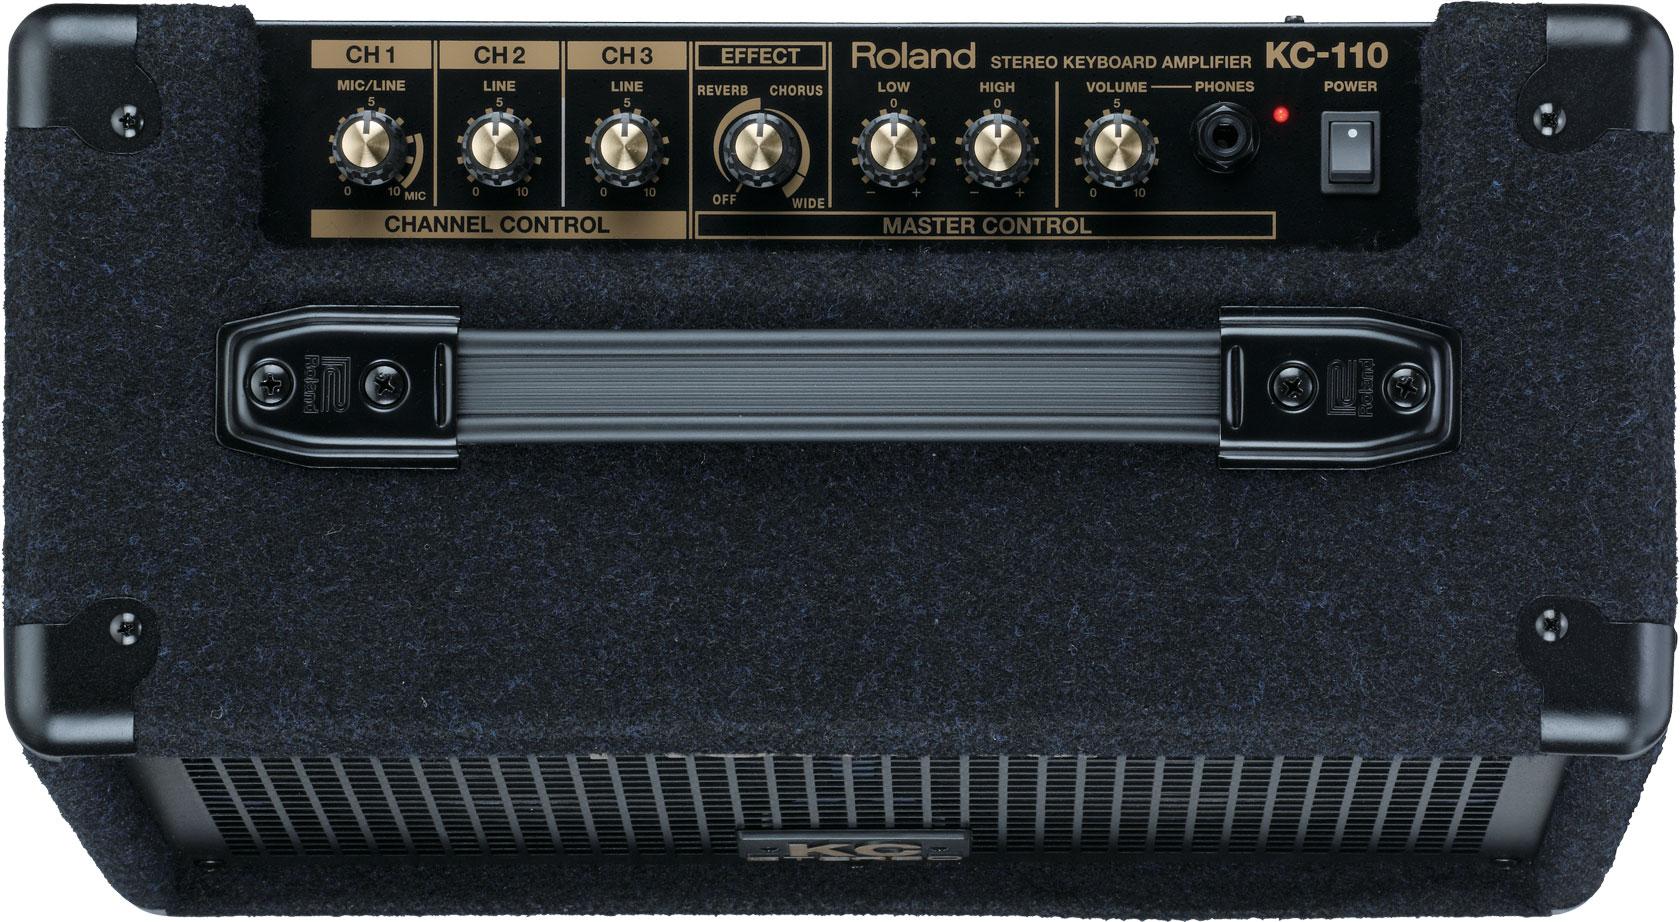 roland kc 110 stereo keyboard amplifier rh roland com Roland KC- 150 Roland KC- 110